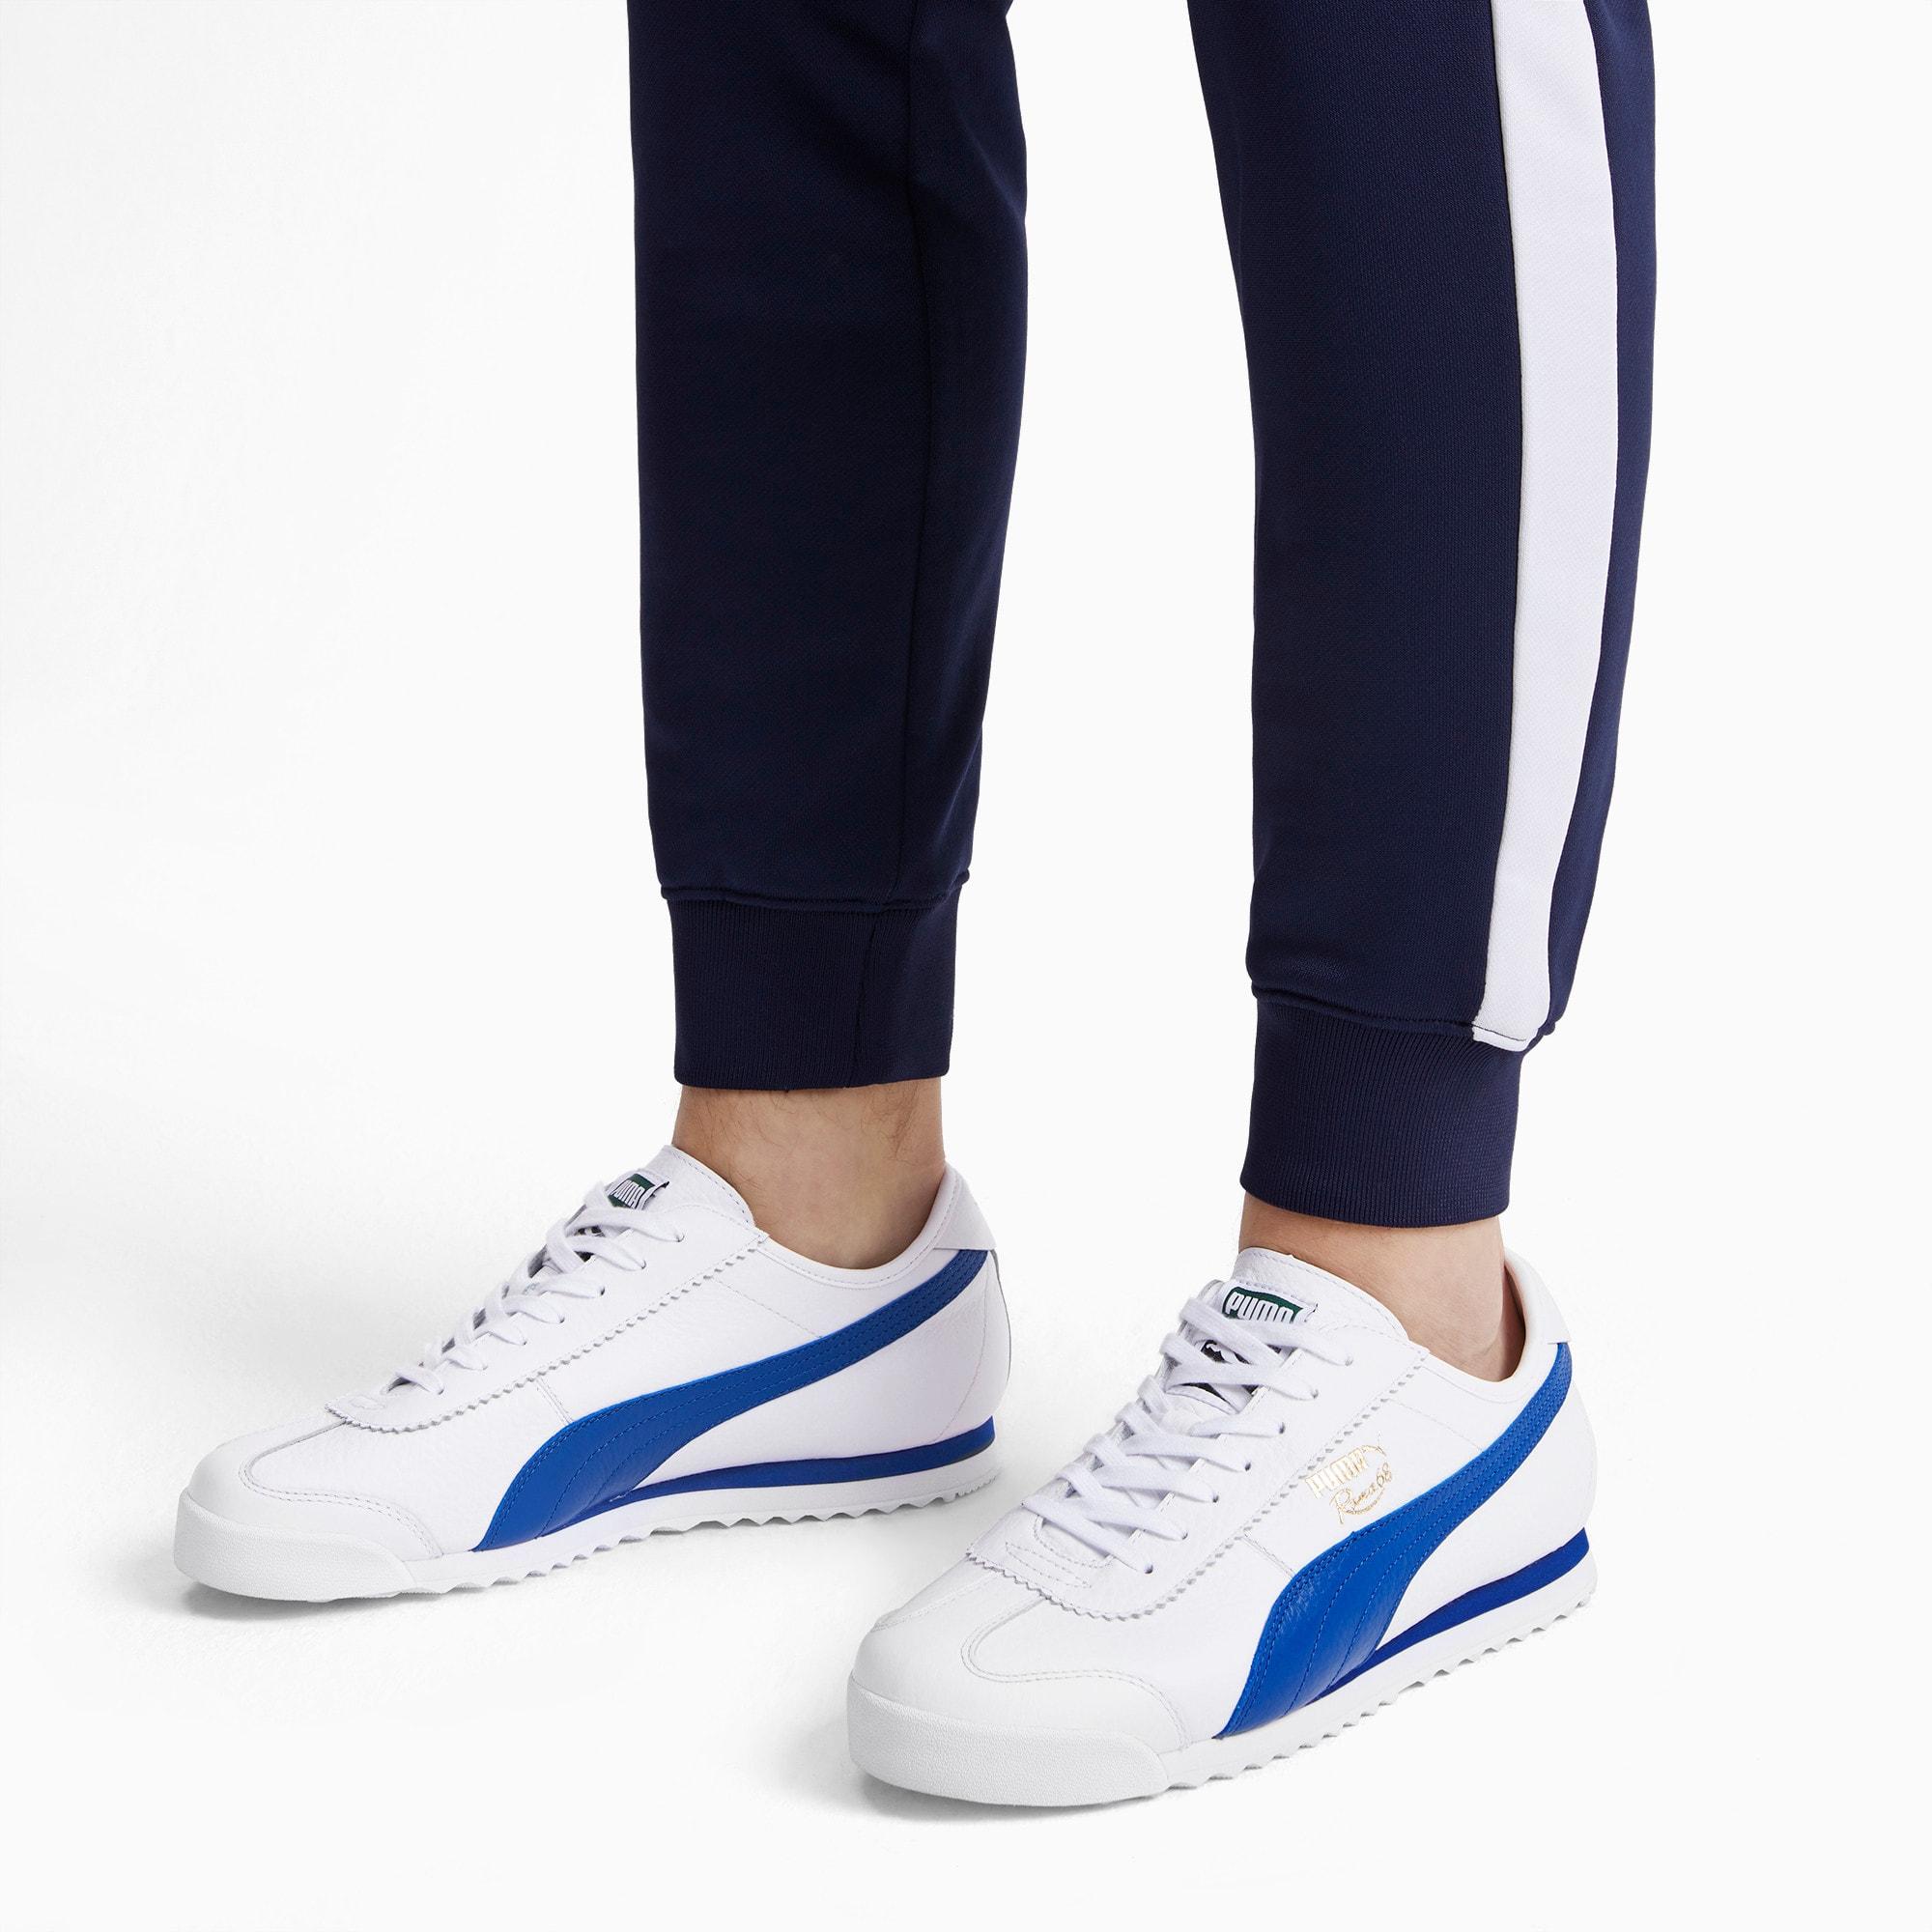 Thumbnail 3 of Roma '68 Vintage Sneakers, Puma White-Galaxy Blue, medium